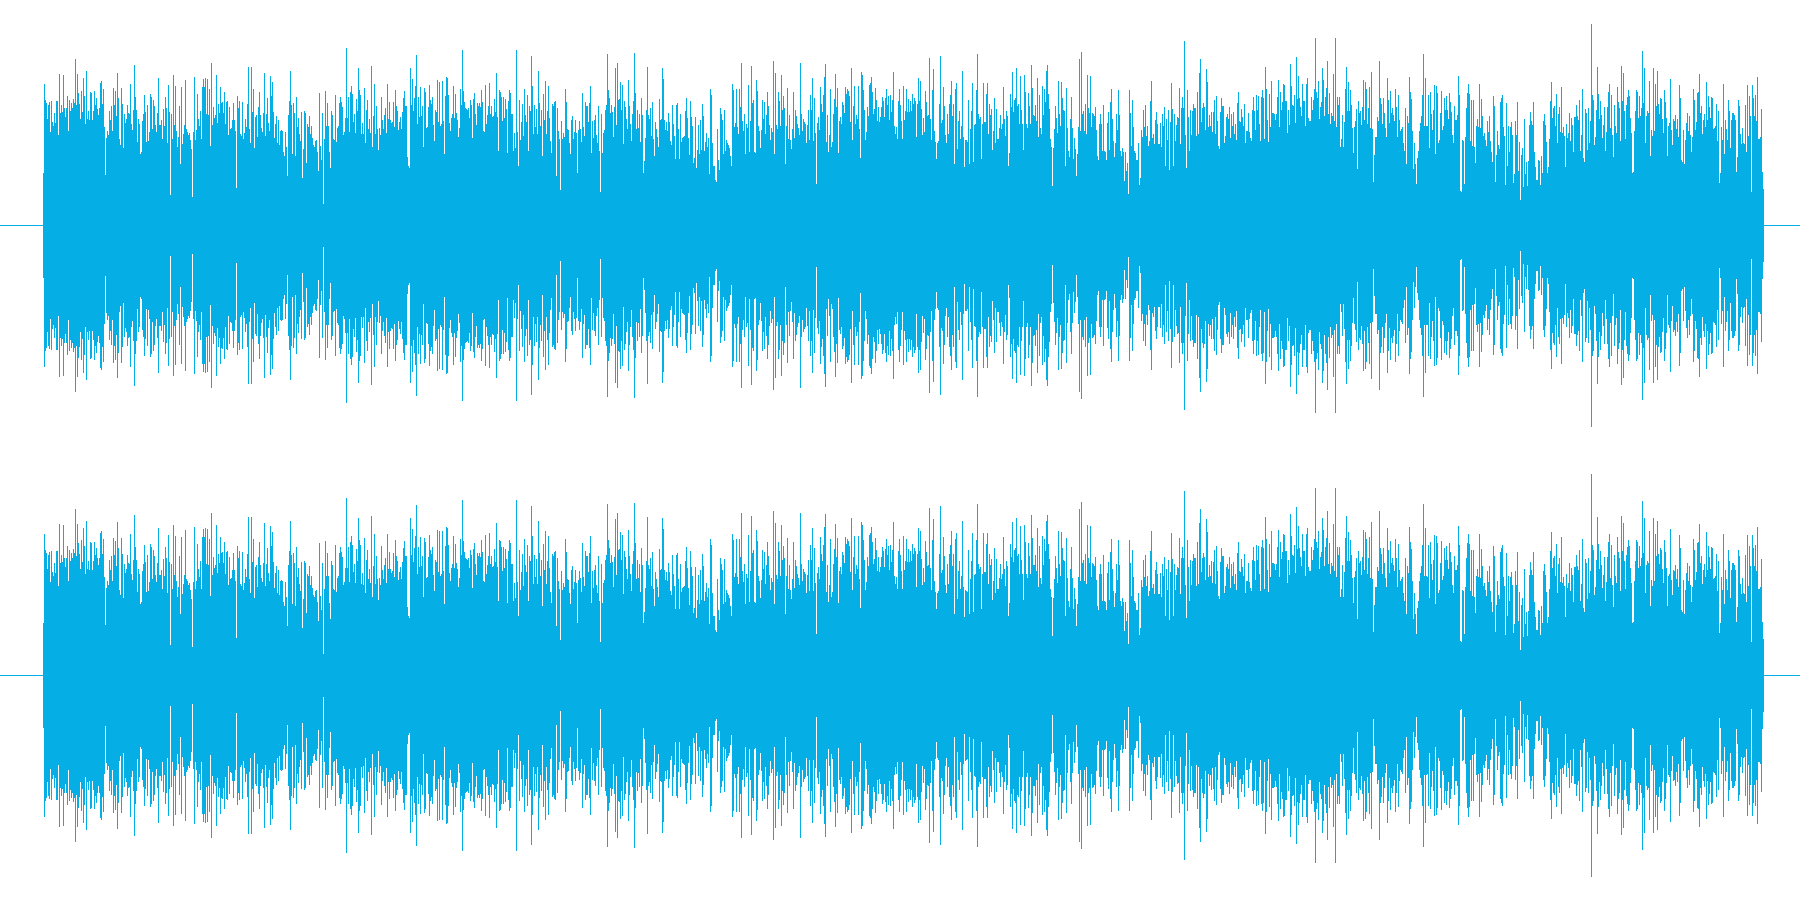 【NES RPG02-12(崩壊)】の再生済みの波形